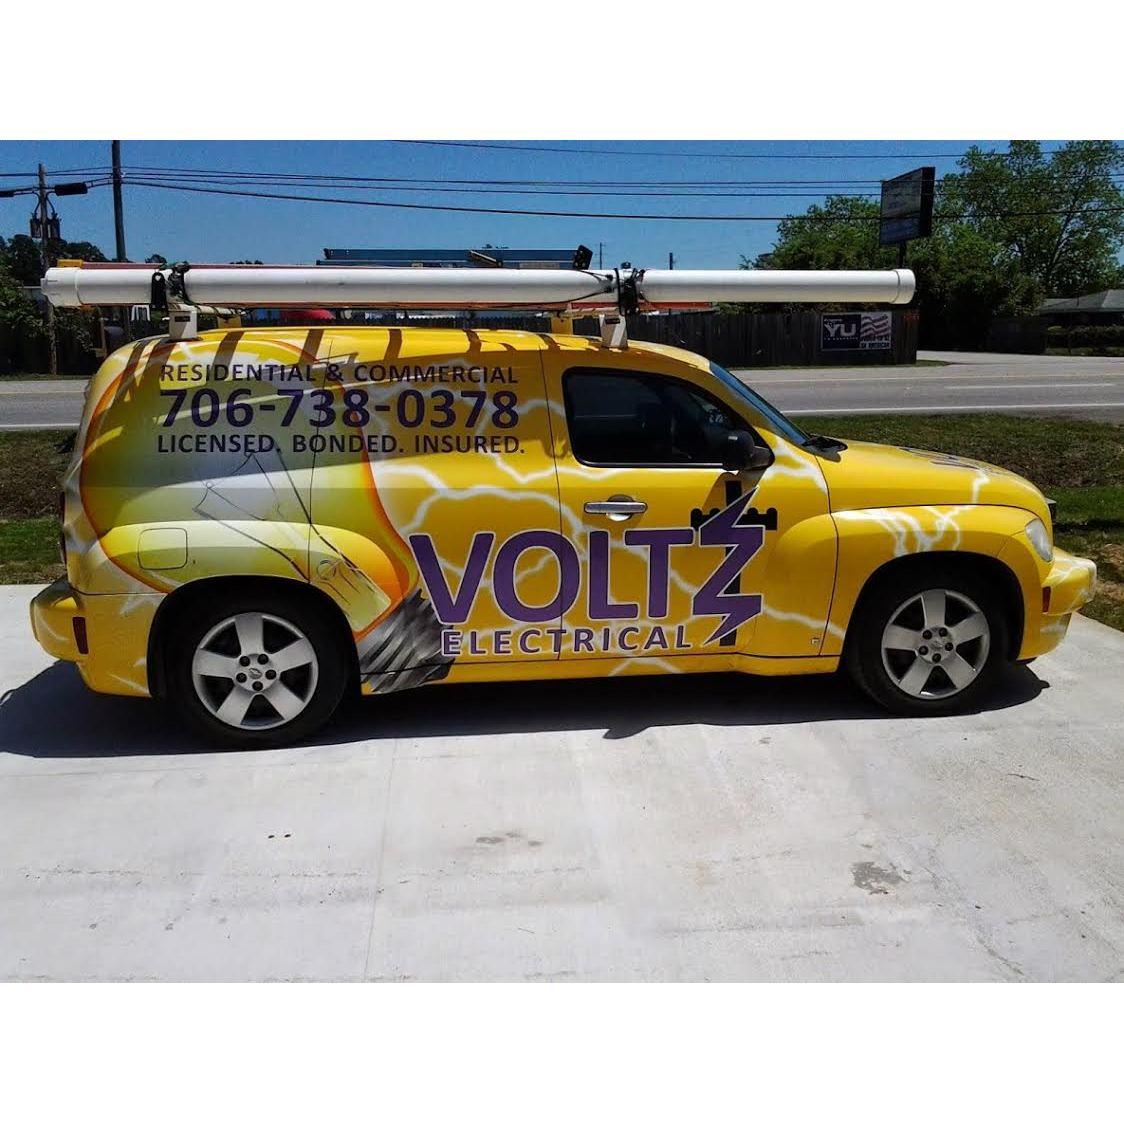 Voltz Electrical Service - Augusta, GA - Electricians